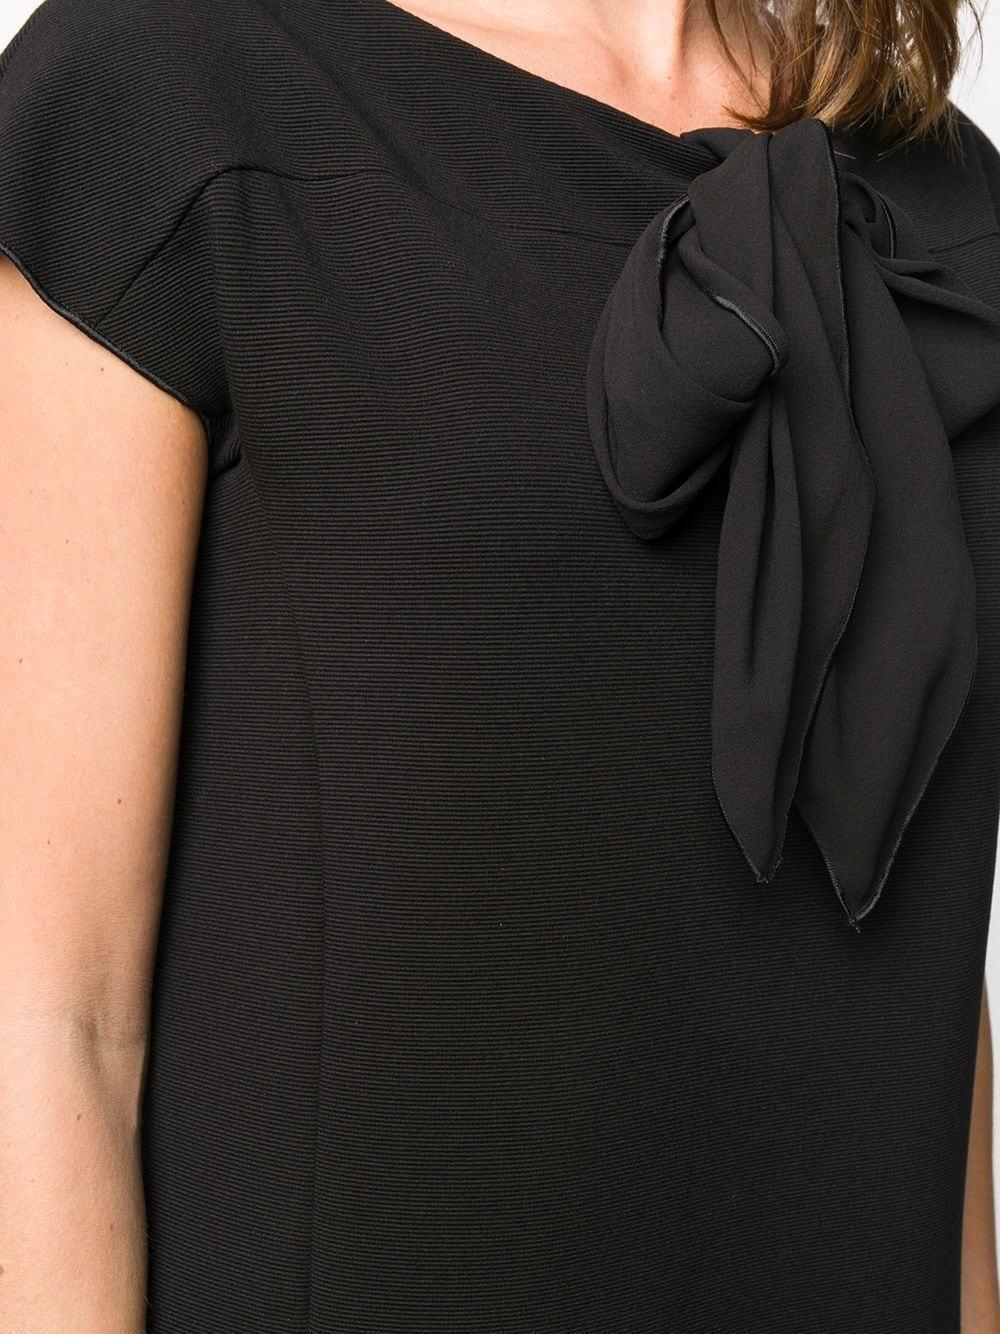 EMPORIO ARMANI Pussy Bow T-shirt Dress